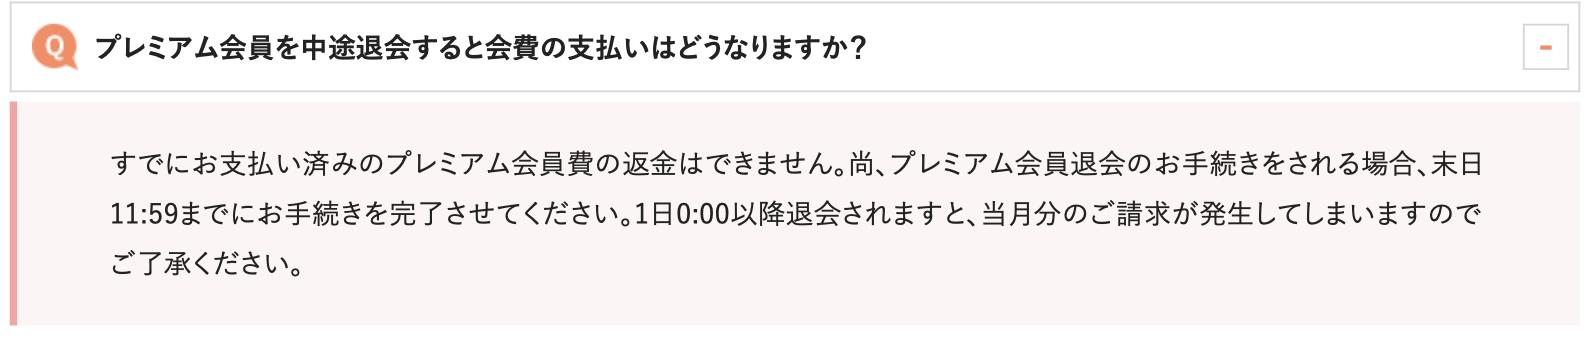 KURADASHI jp(蔵出し.jp) プレミアム会員の退会における注意事項